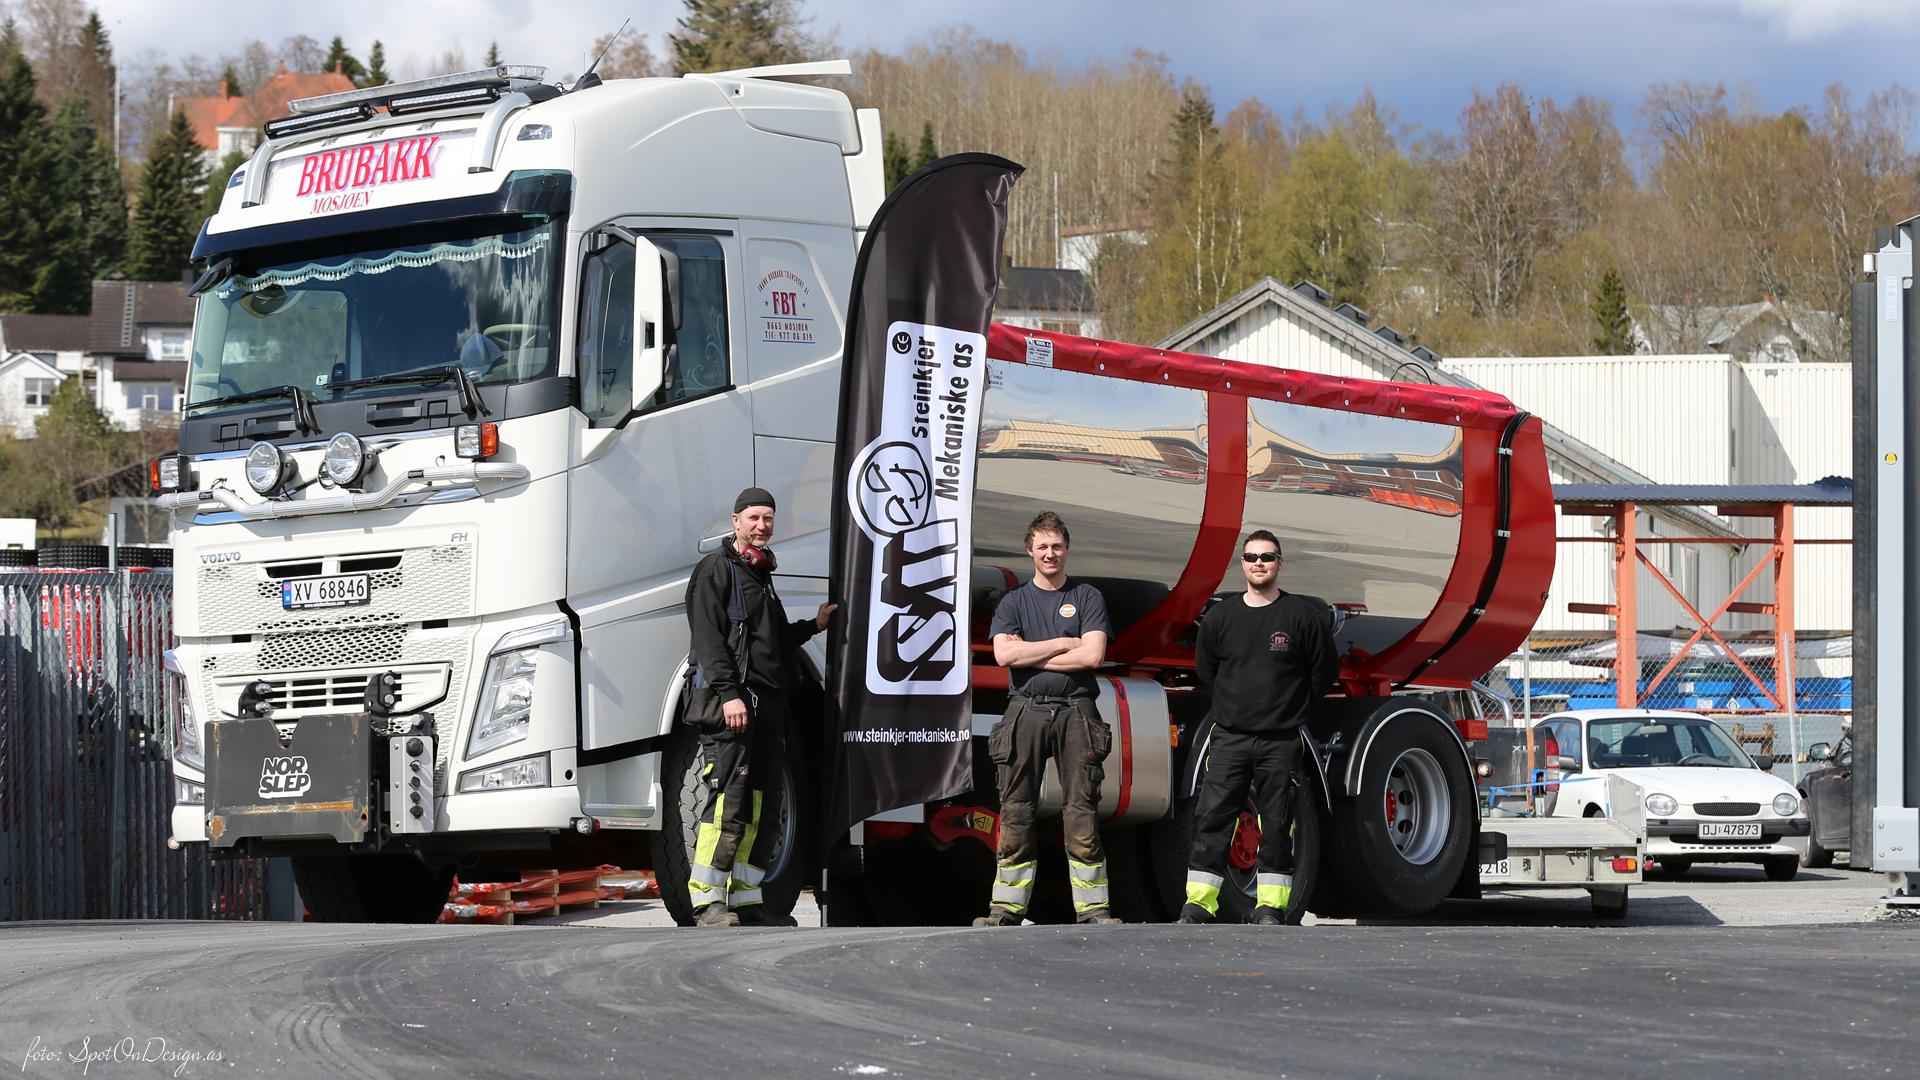 Asfaltbalje/Asfalttraug i Hardox 450 Stål levert · Kunde: Frank Brubakk Transport AS